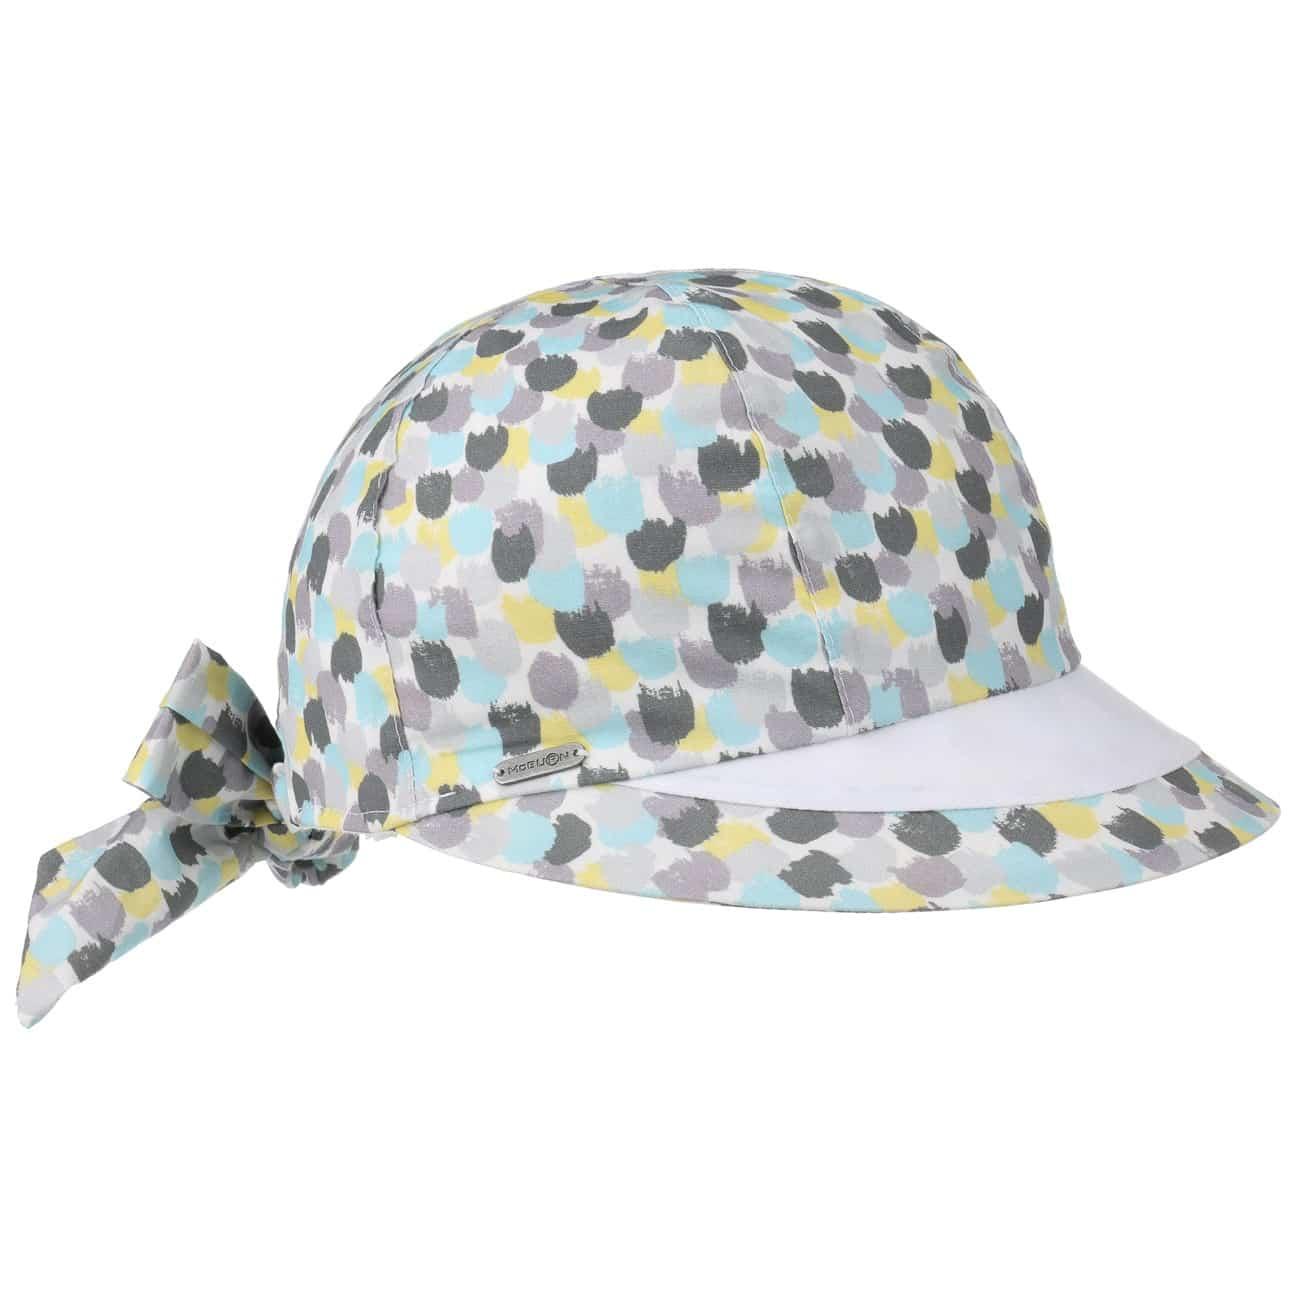 Gorra de Mujer Dots by McBURN  gorra de verano